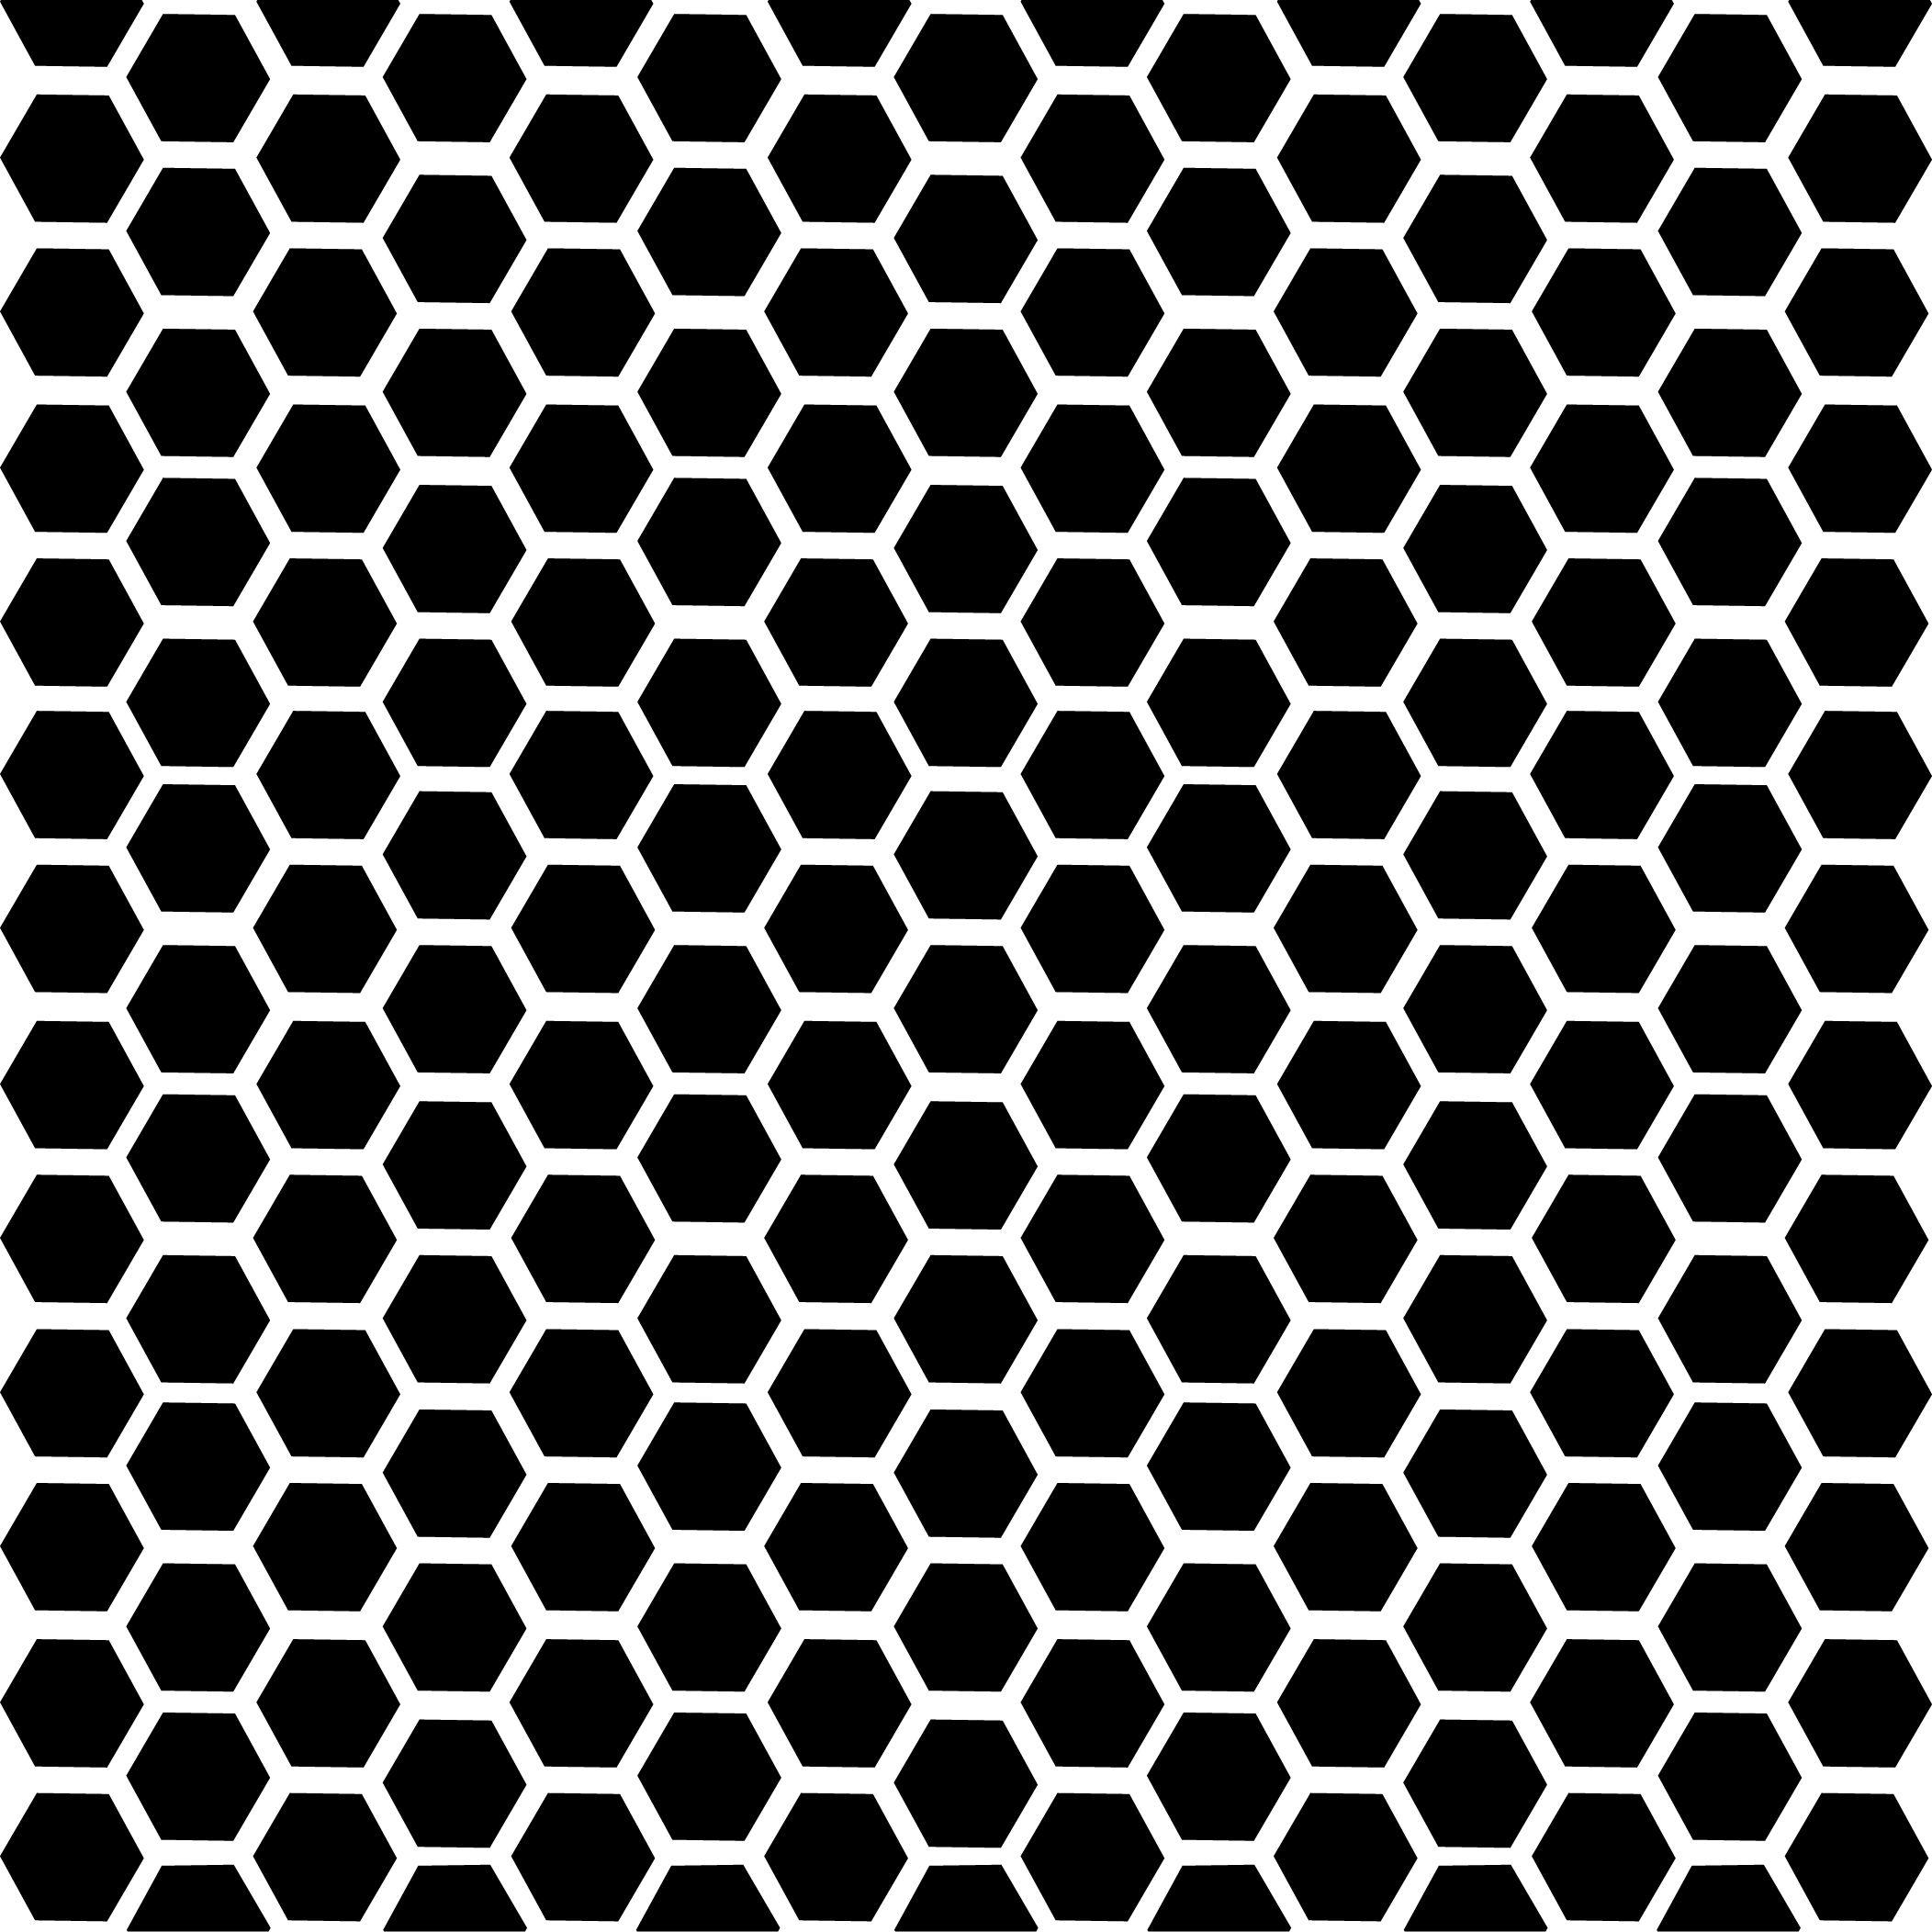 Honeycomb Pattern Illustrator   www.imgkid.com - The Image ...